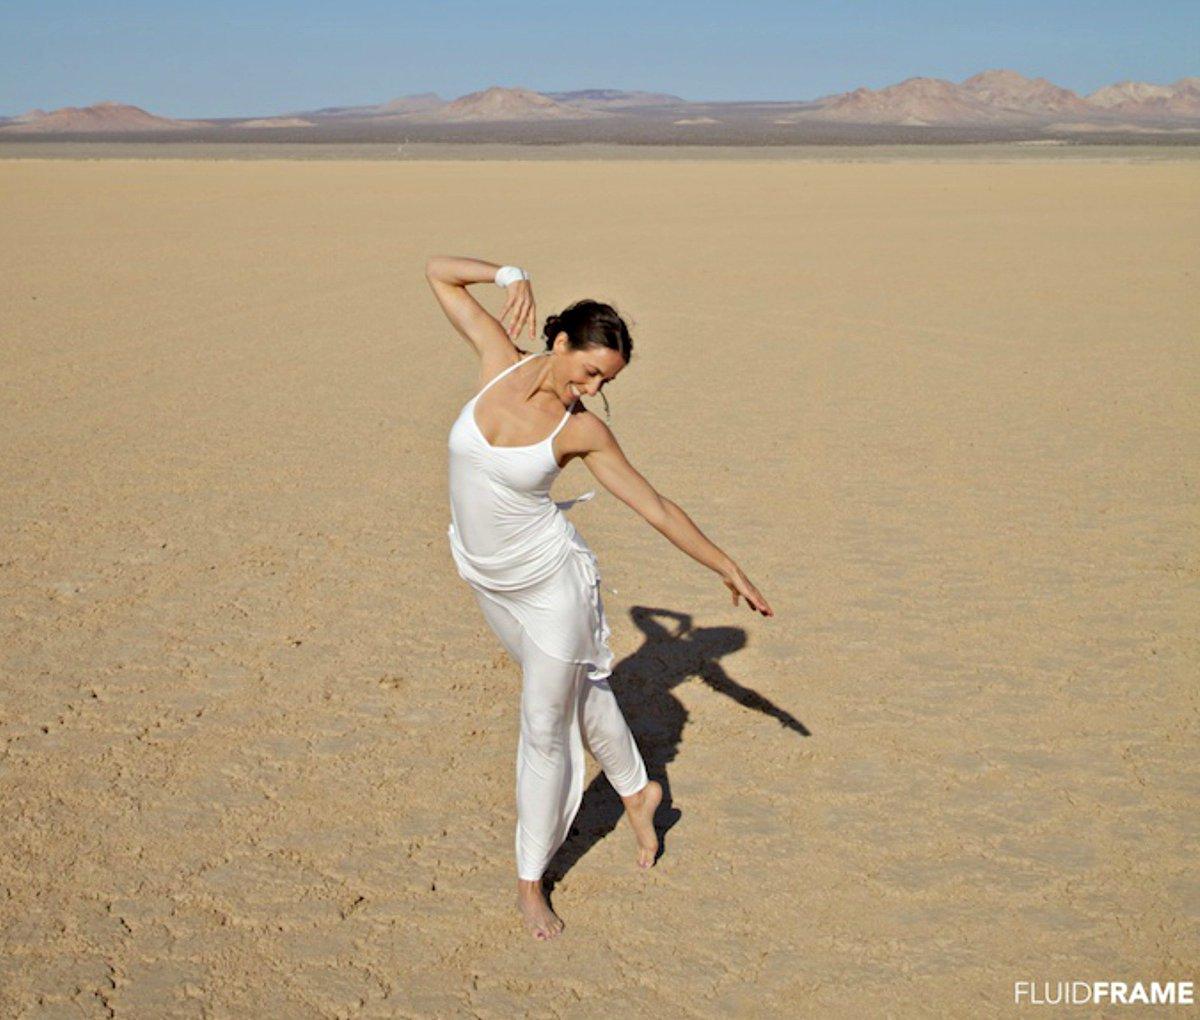 50dd3ca4fbc61 What to Wear for #Kundalini Yoga: 5 Ways to Wear White Yoga Clothes  http://buff.ly/1NYykHG pic.twitter.com/vf4lBjioJv